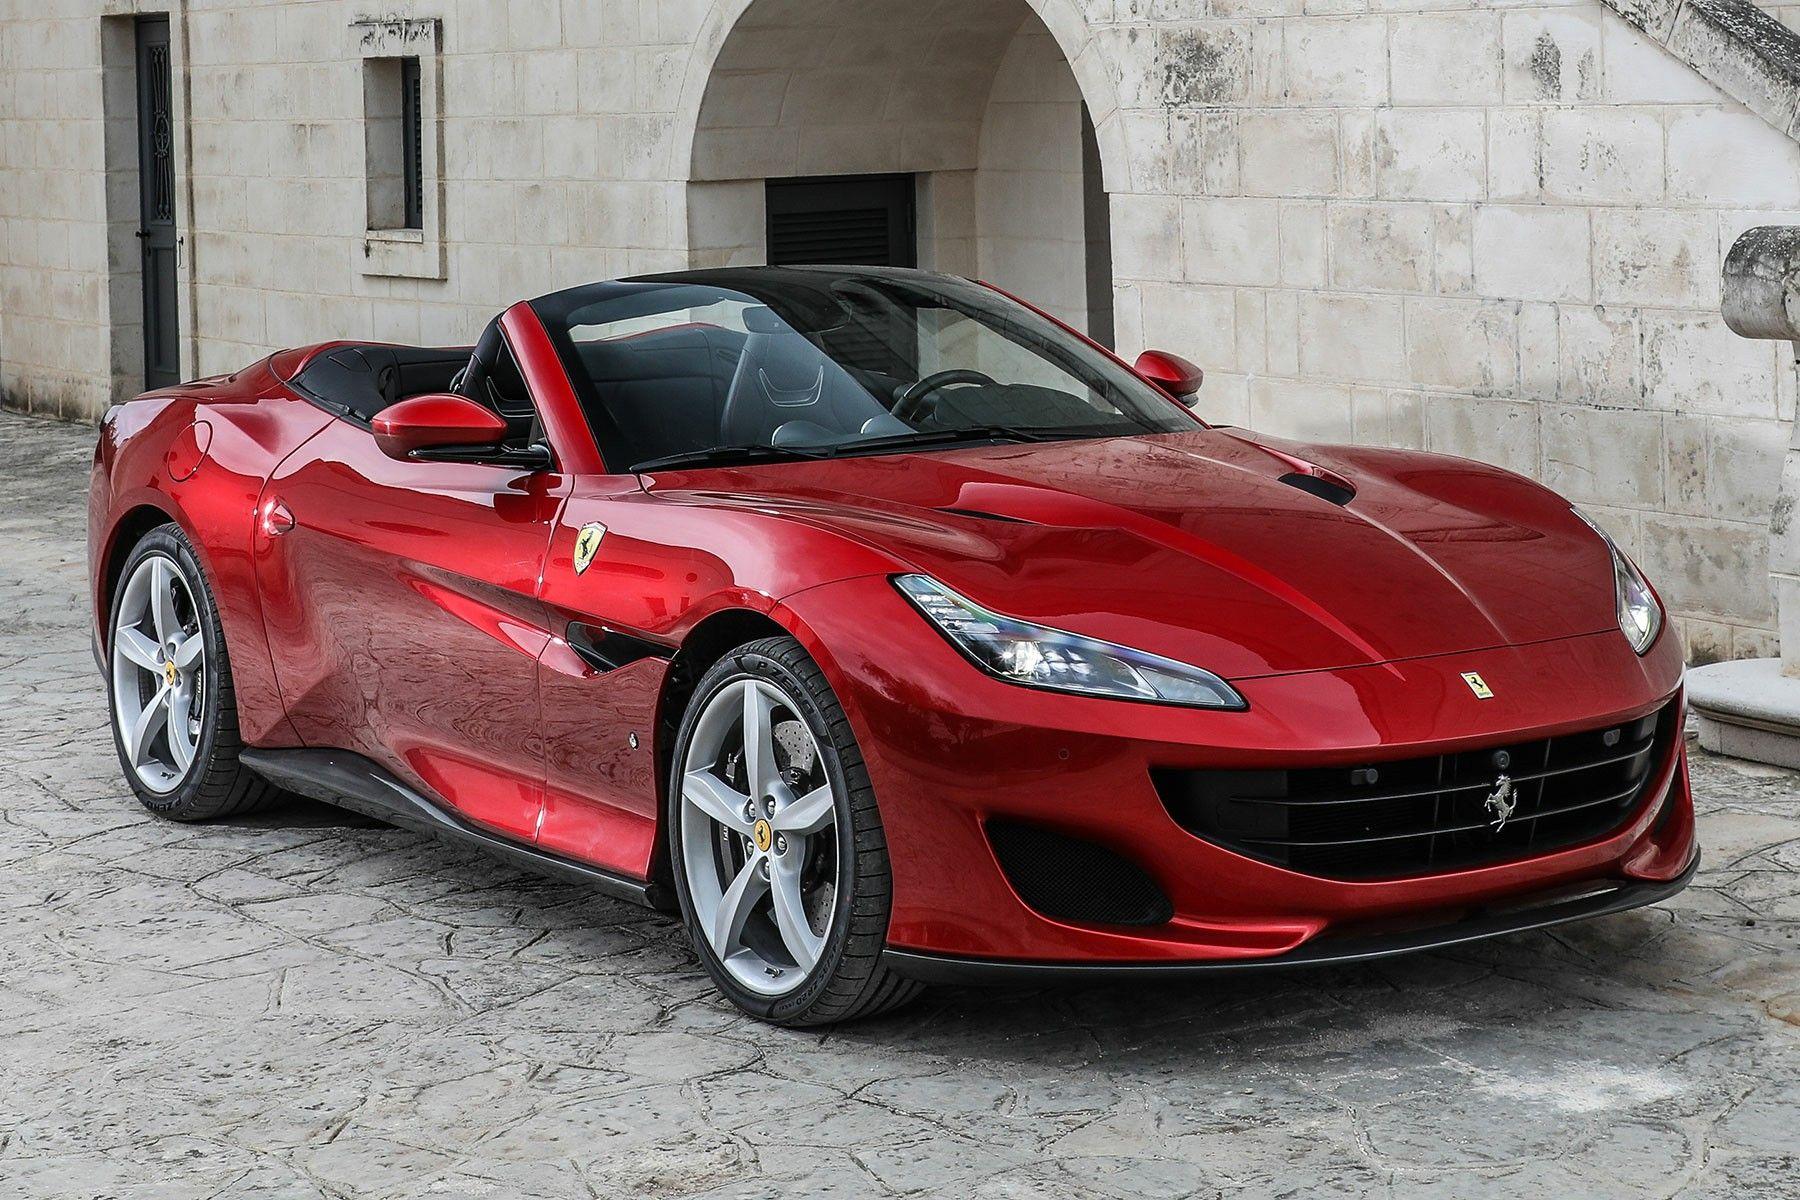 Candy Apple Red Ferrari, Luxury cars, Car